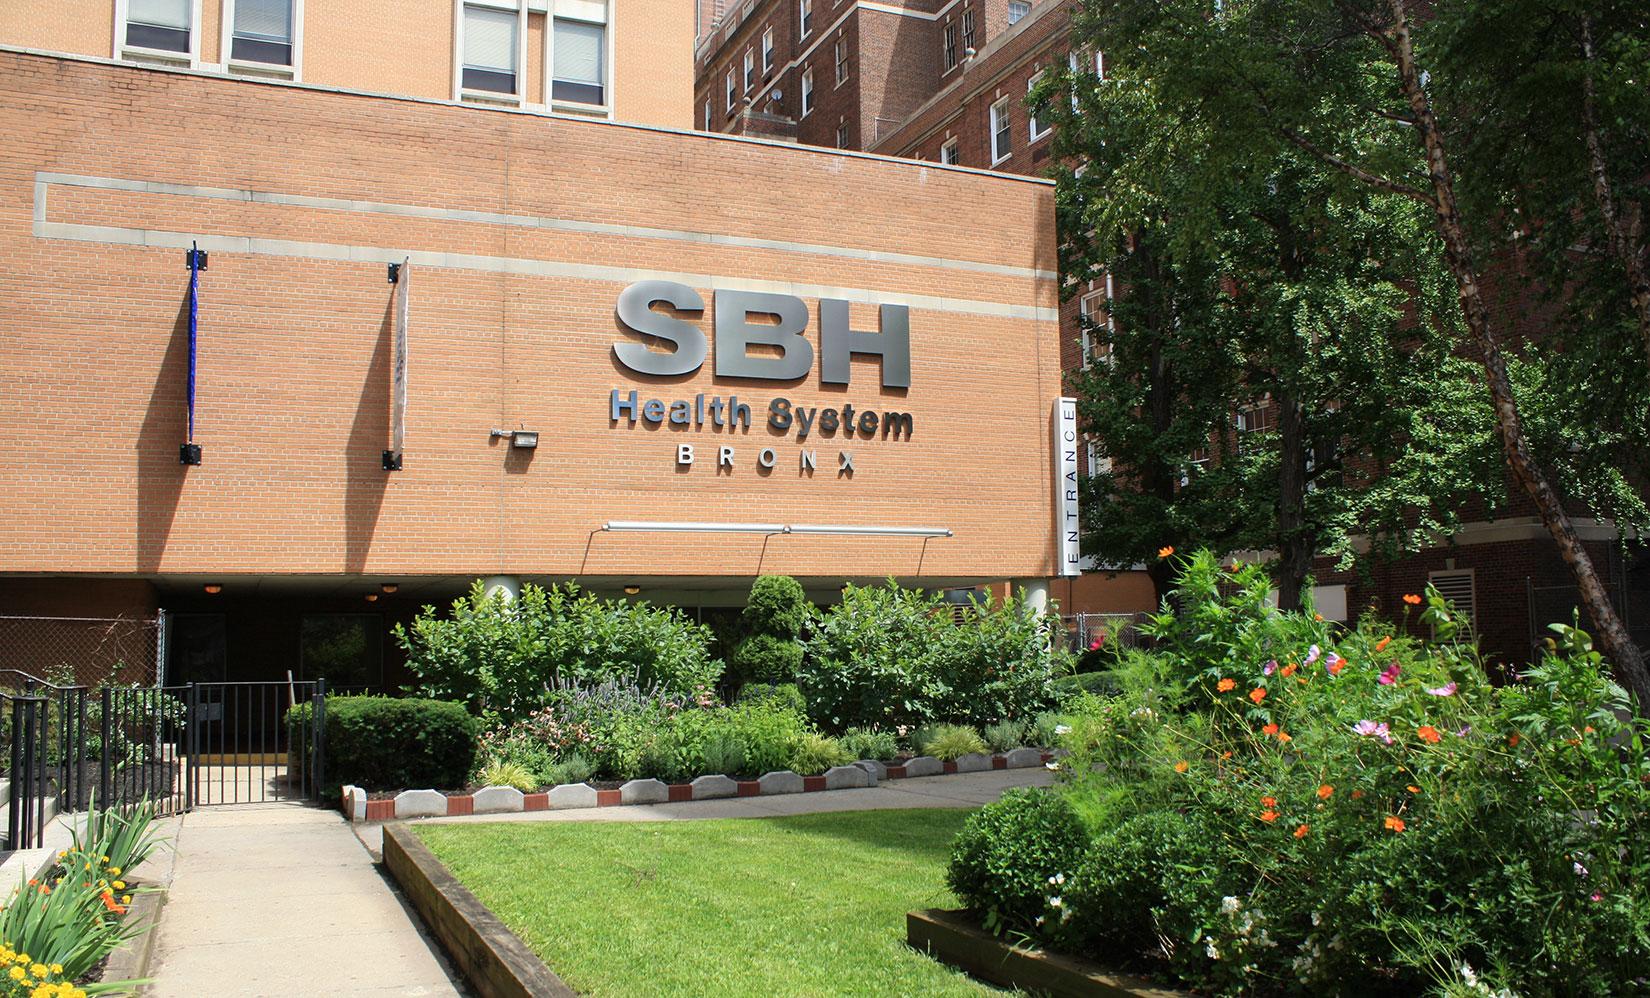 Image of SBH Health Sytem exterior